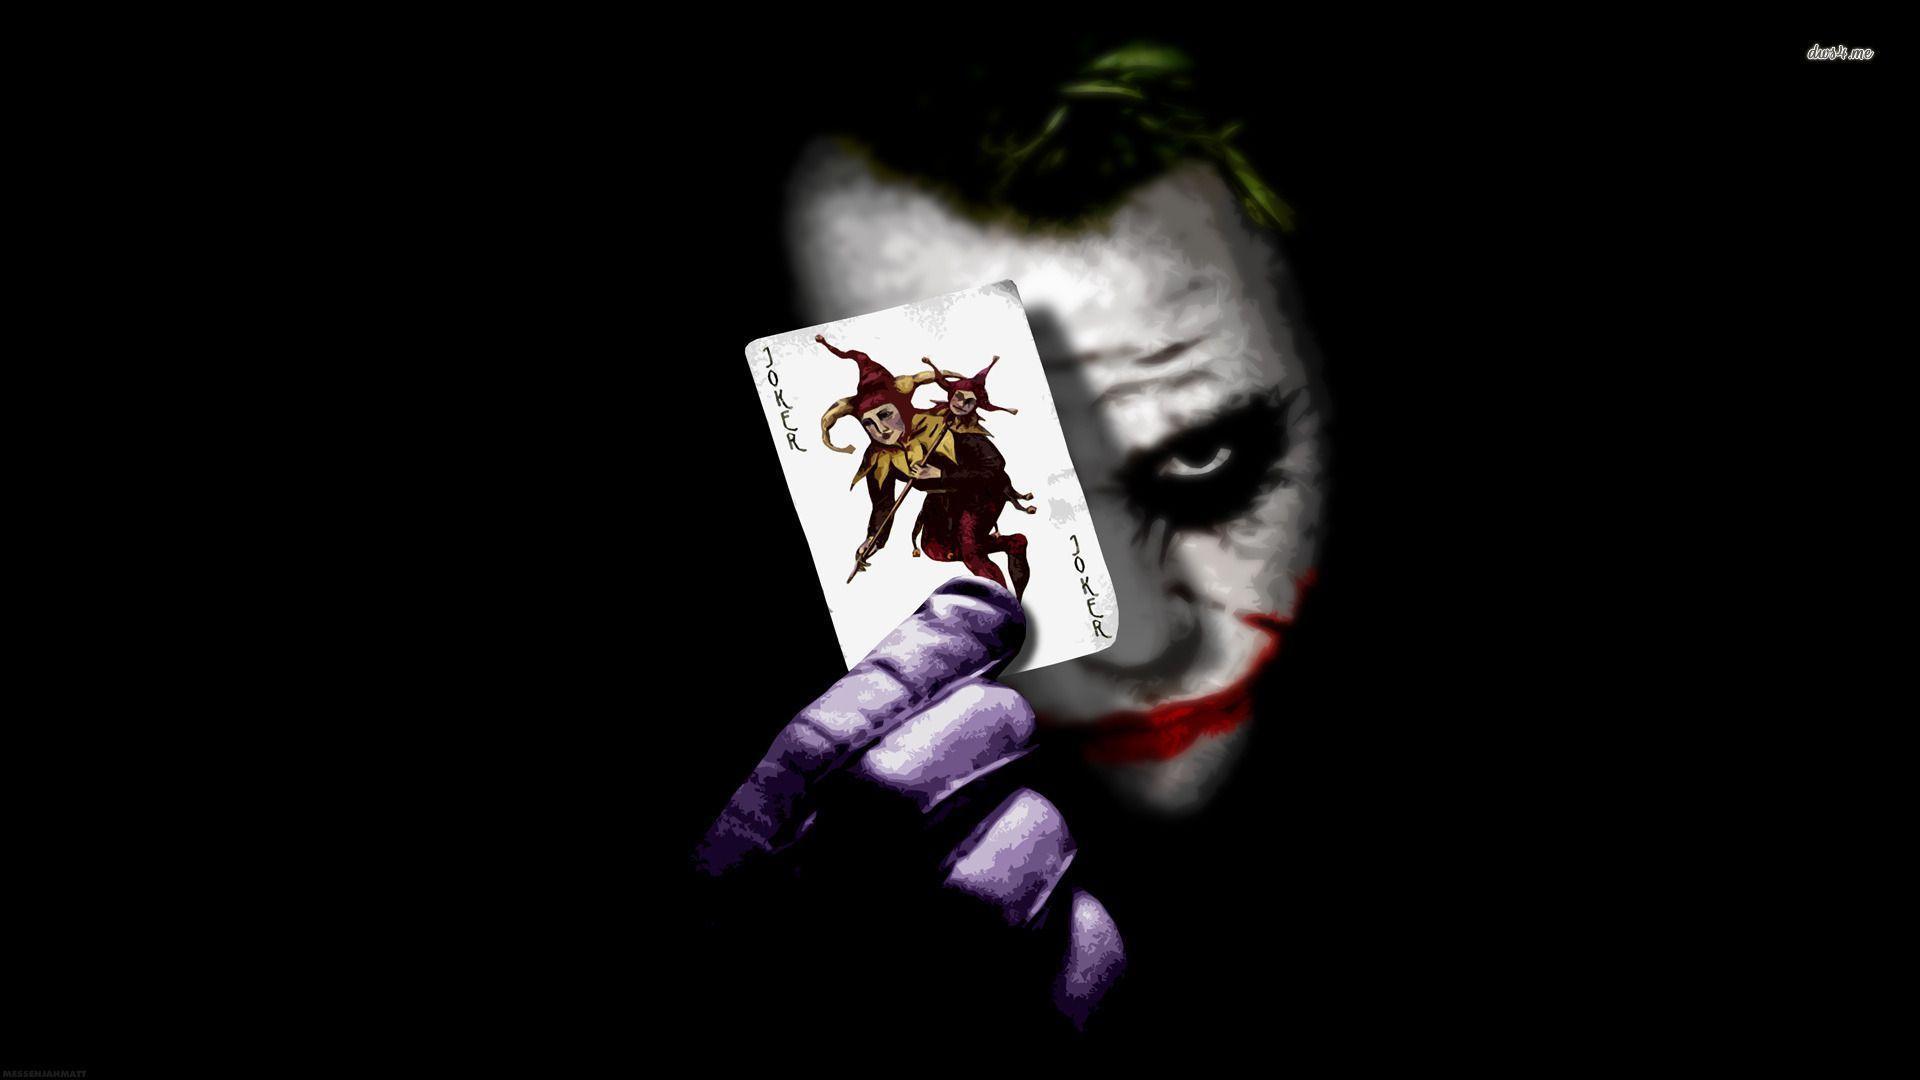 Joker Cards Wallpapers Wallpaper Cave